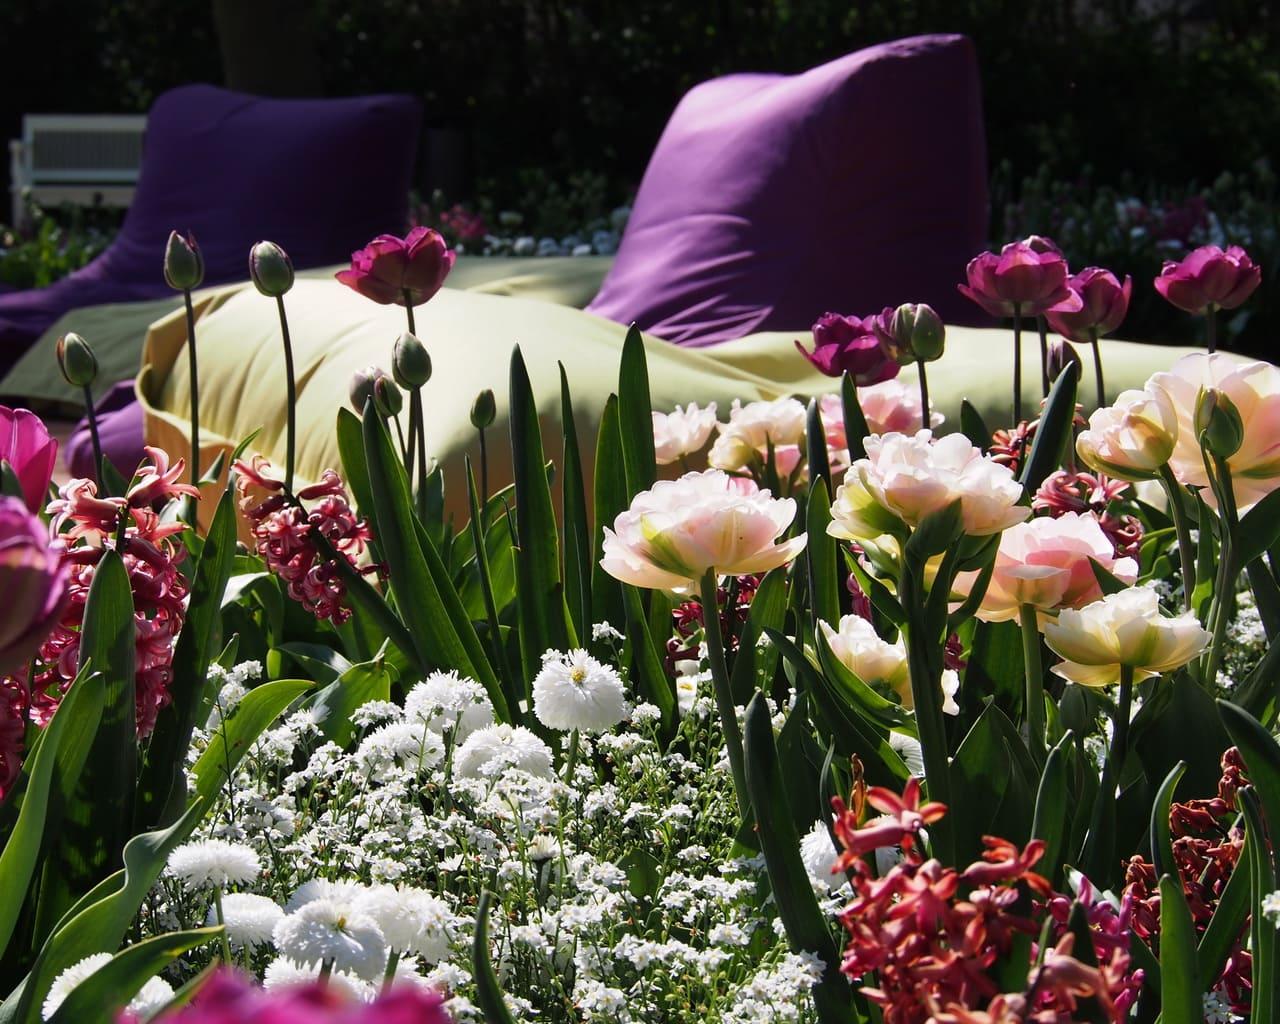 Silent Islands mit Tulpen im Frühling, Landesgartenschau Eutin 2016, Planung Petra Pelz